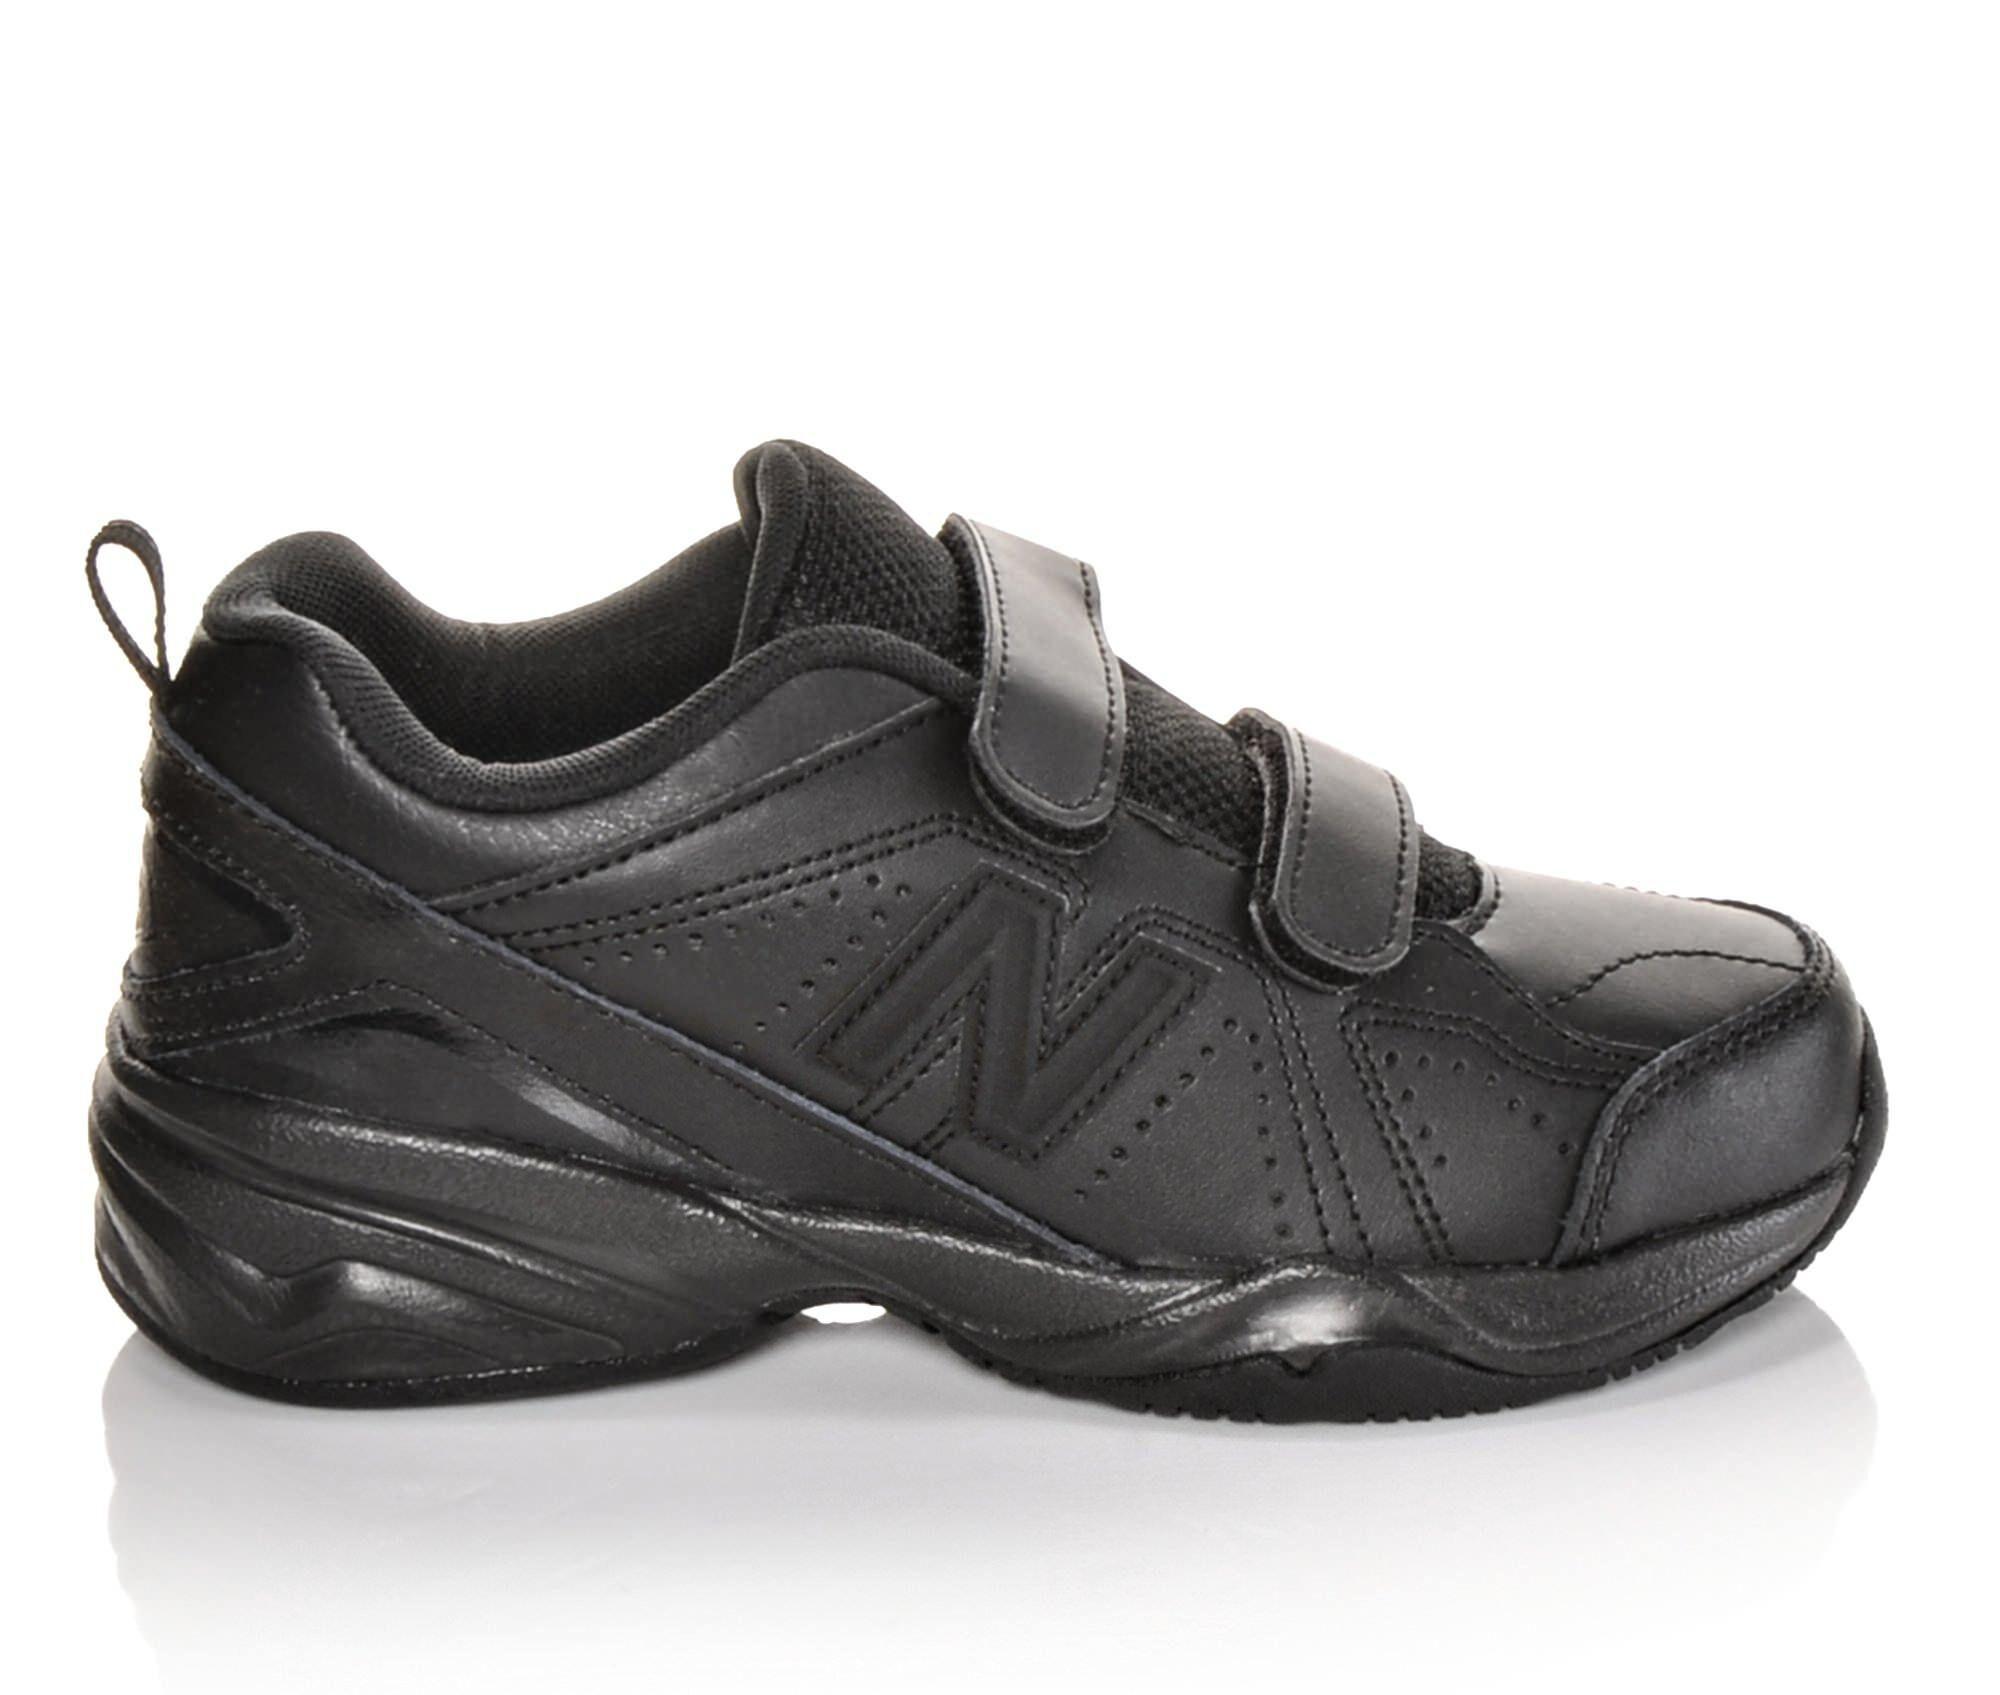 New Balance Shoes New Balance KV624BKY 10 5 3 Boys Sports Shoes Black